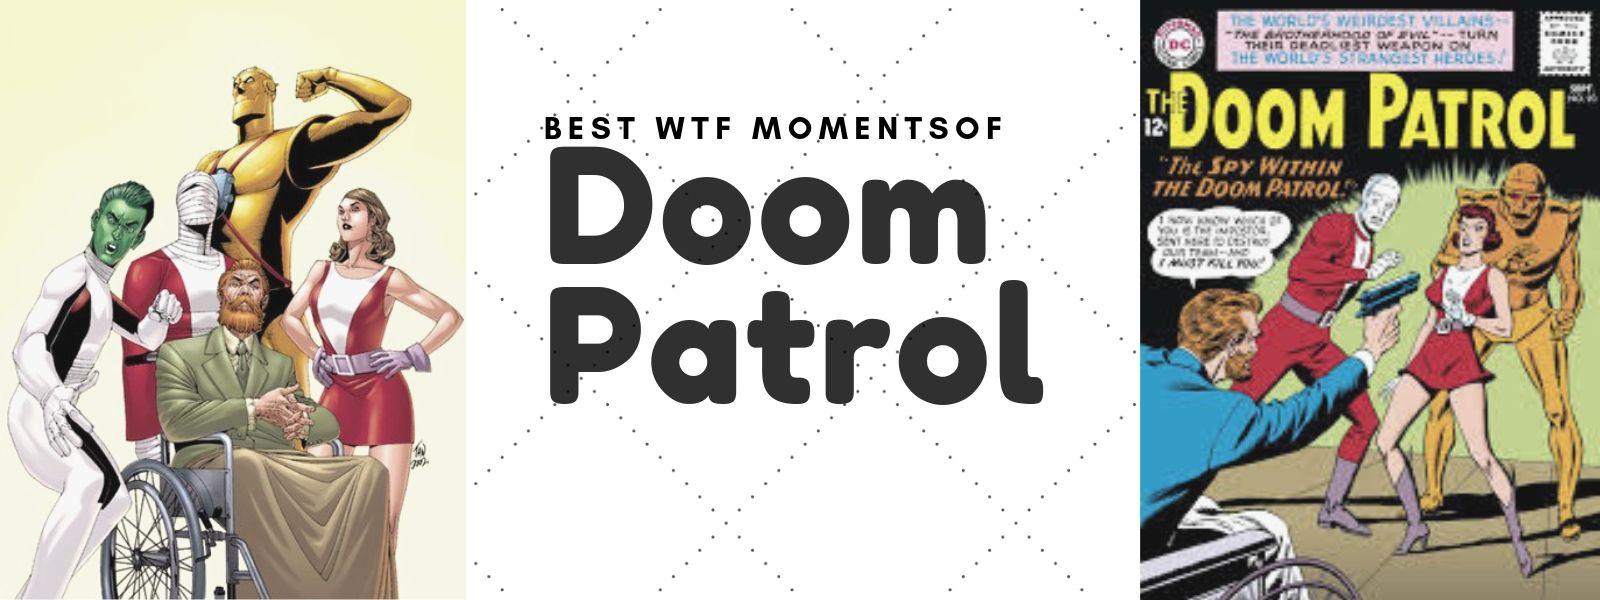 doom-patrol-header-image-dc-comics